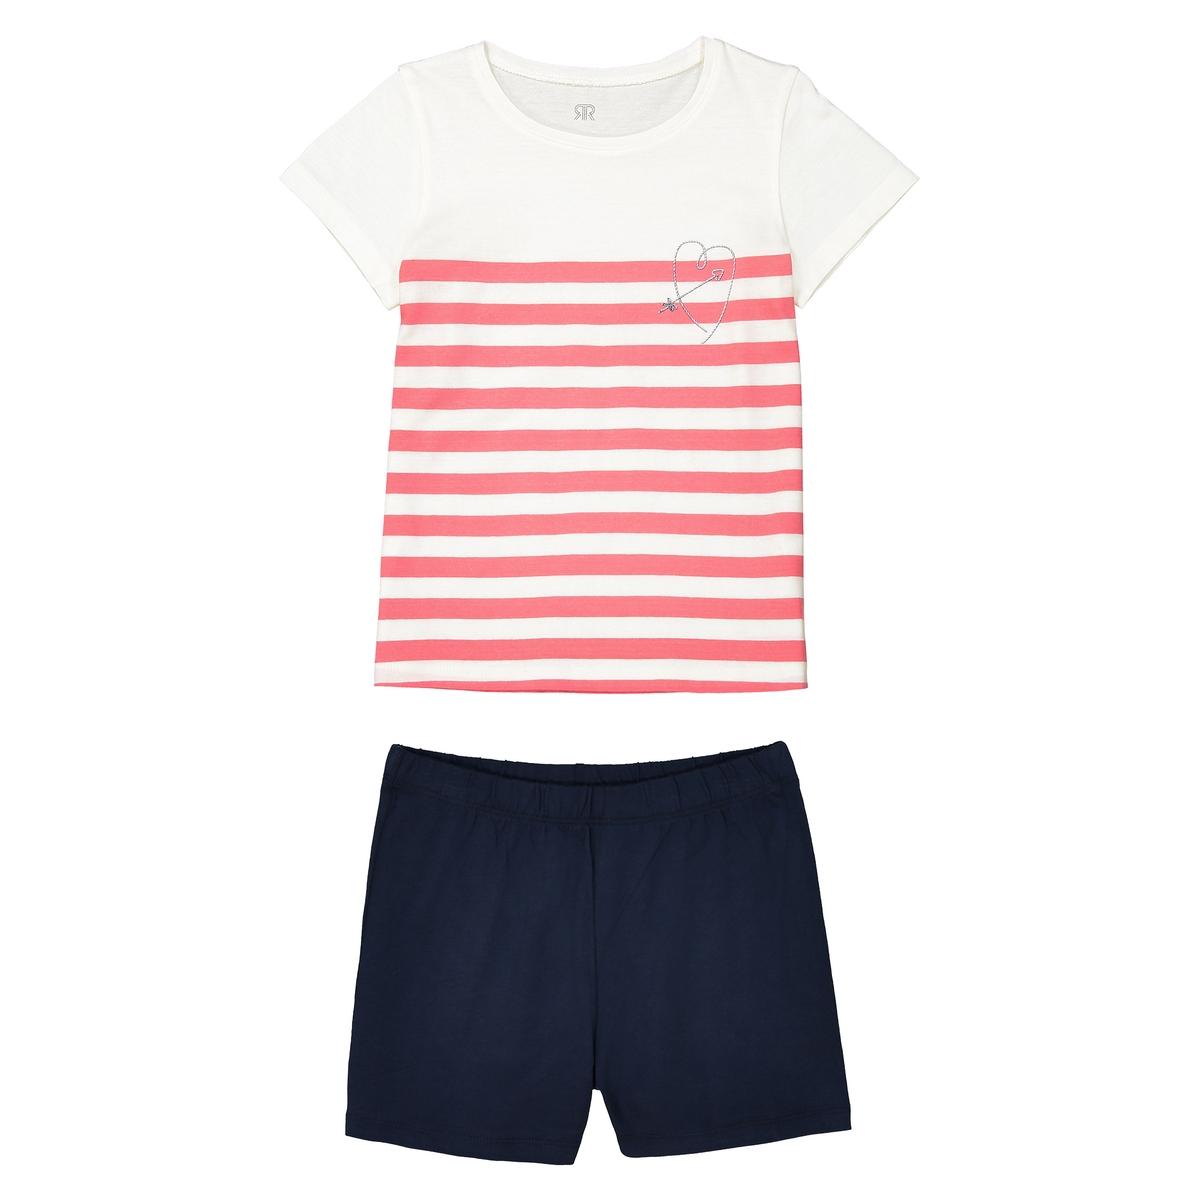 Пижама с шортами с рисунком и короткими рукавами, 3-12 лет пижама с шортами с рисунком 2 12 лет